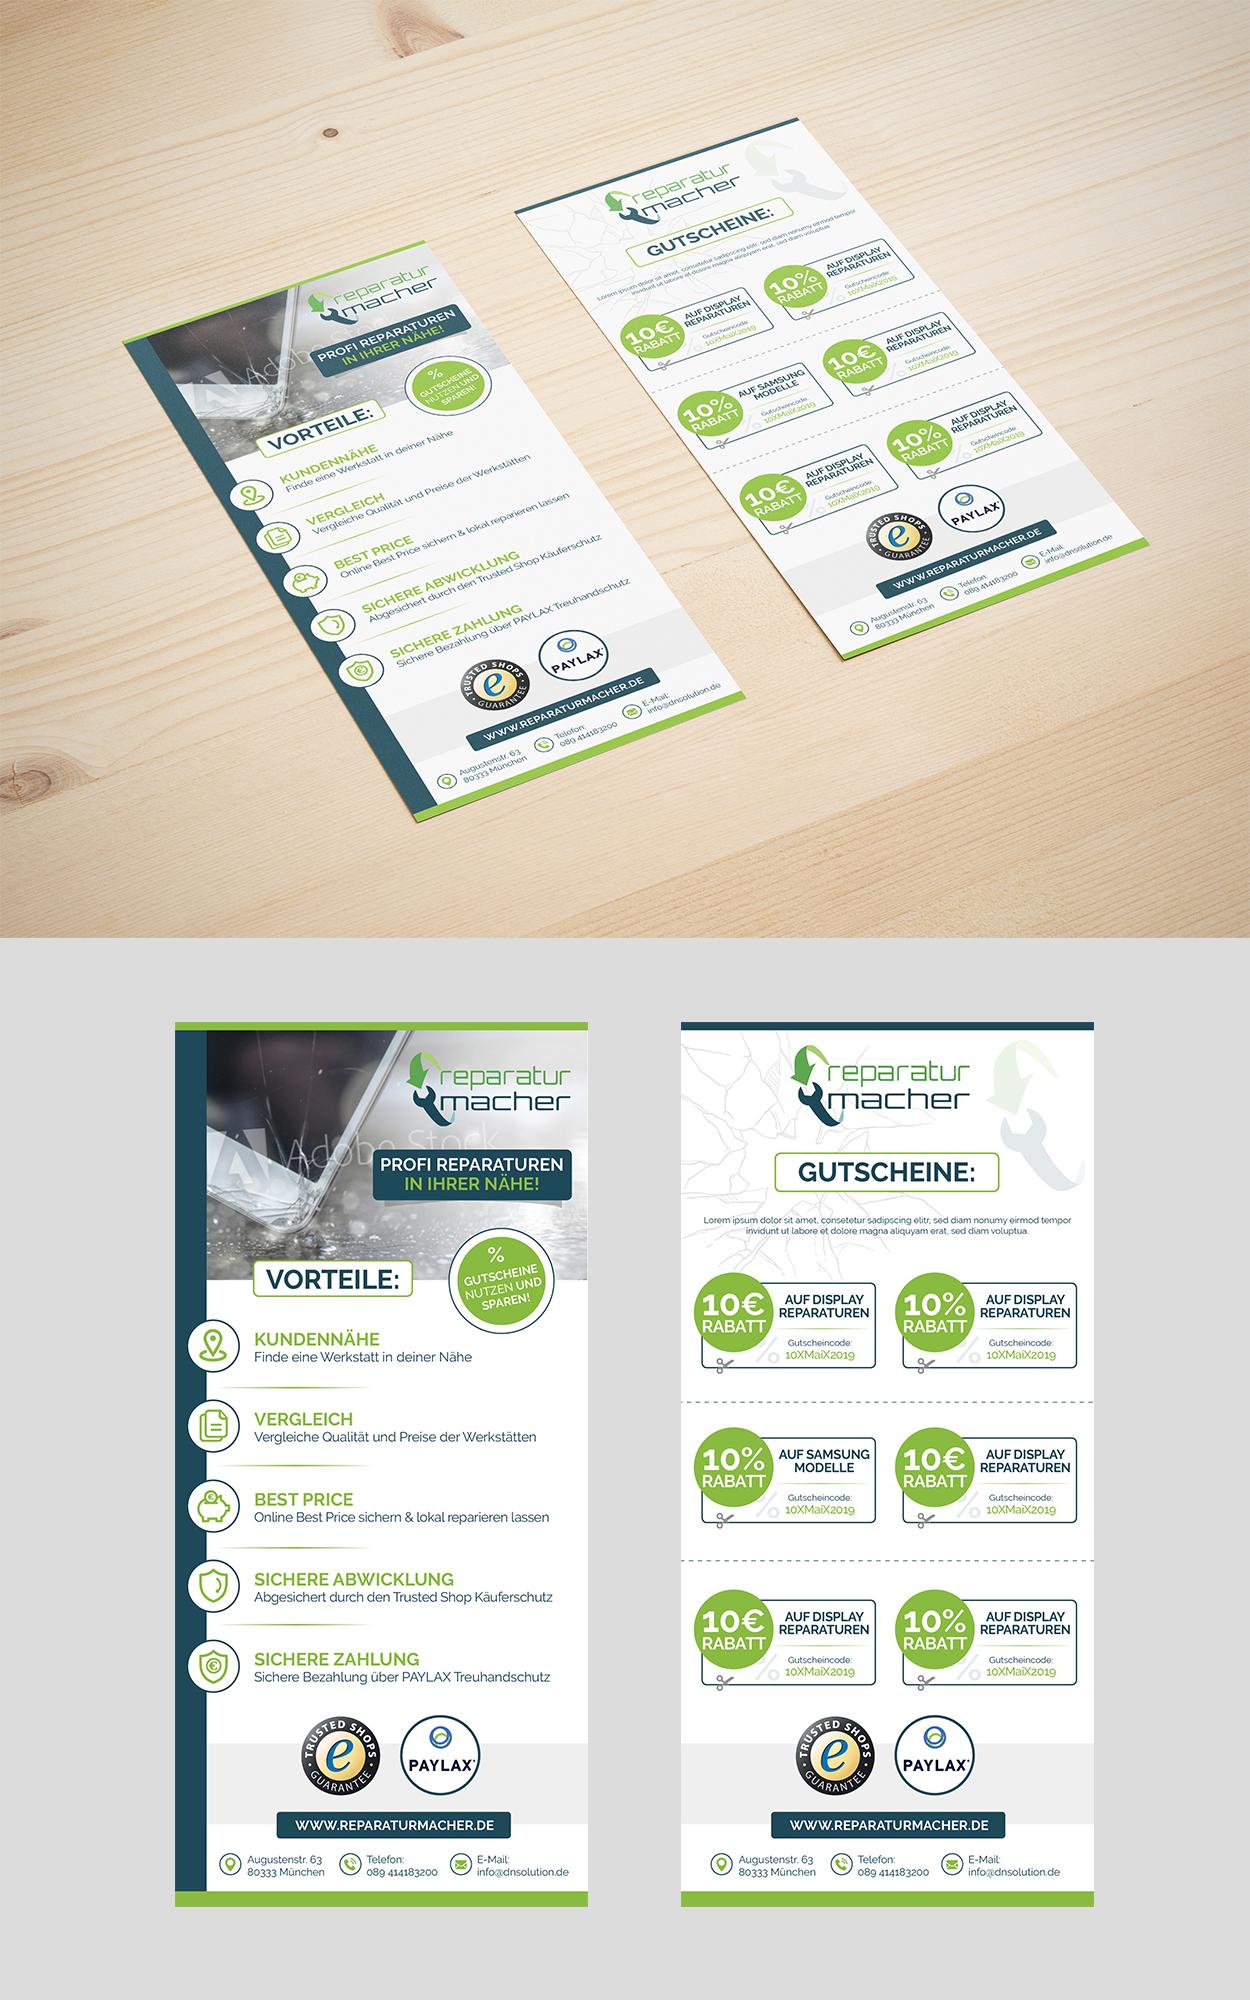 design #3 of MaDesigns